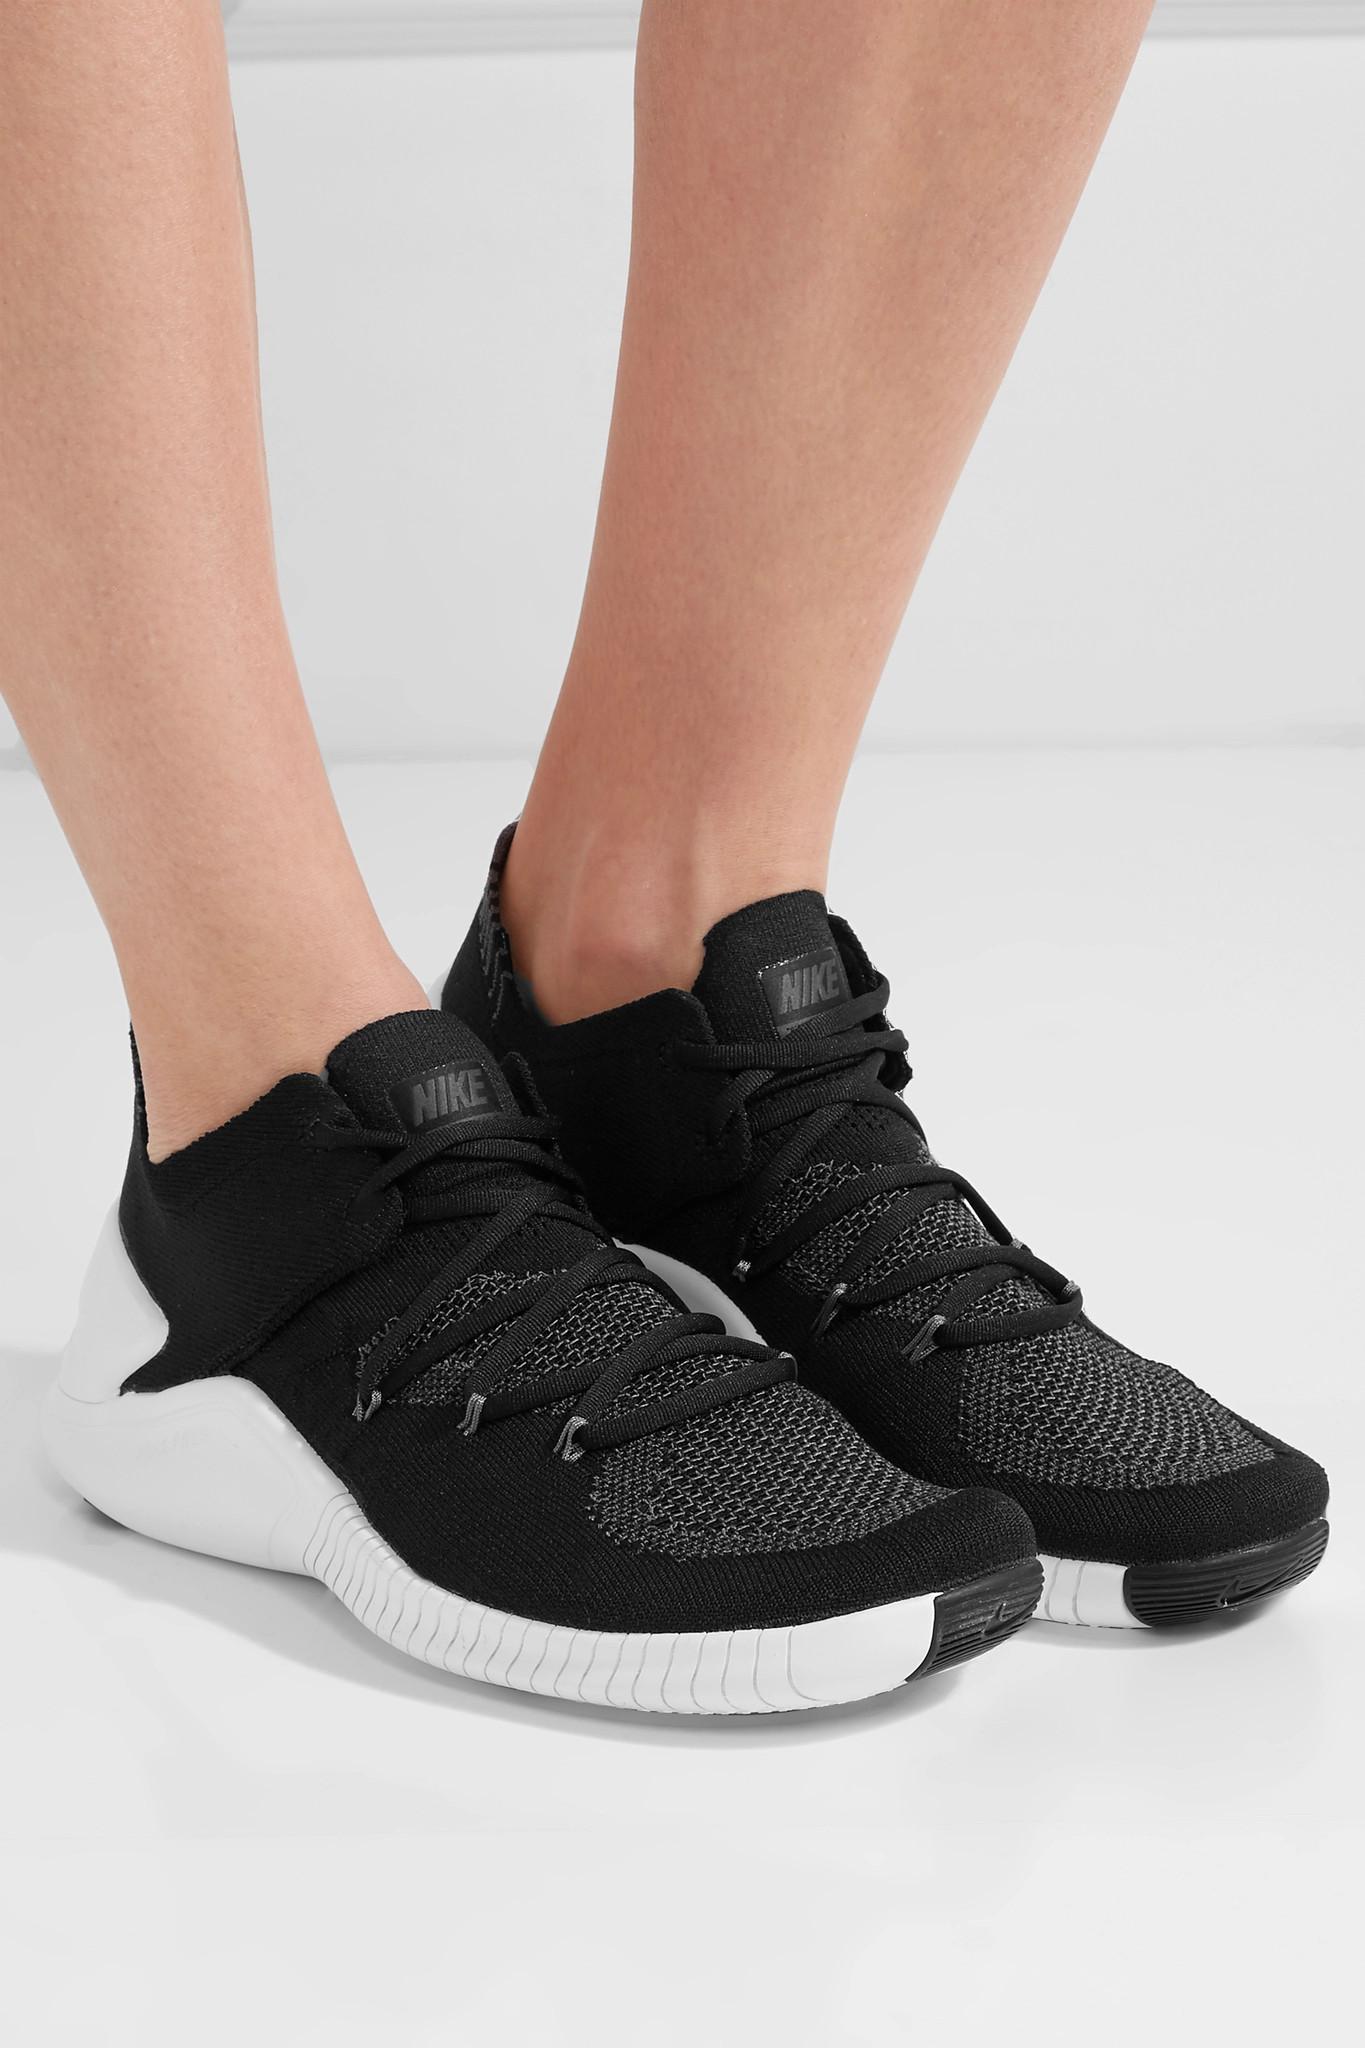 9f544eac079ad Lyst - Nike Free Tr 3 Flyknit Sneakers in Black